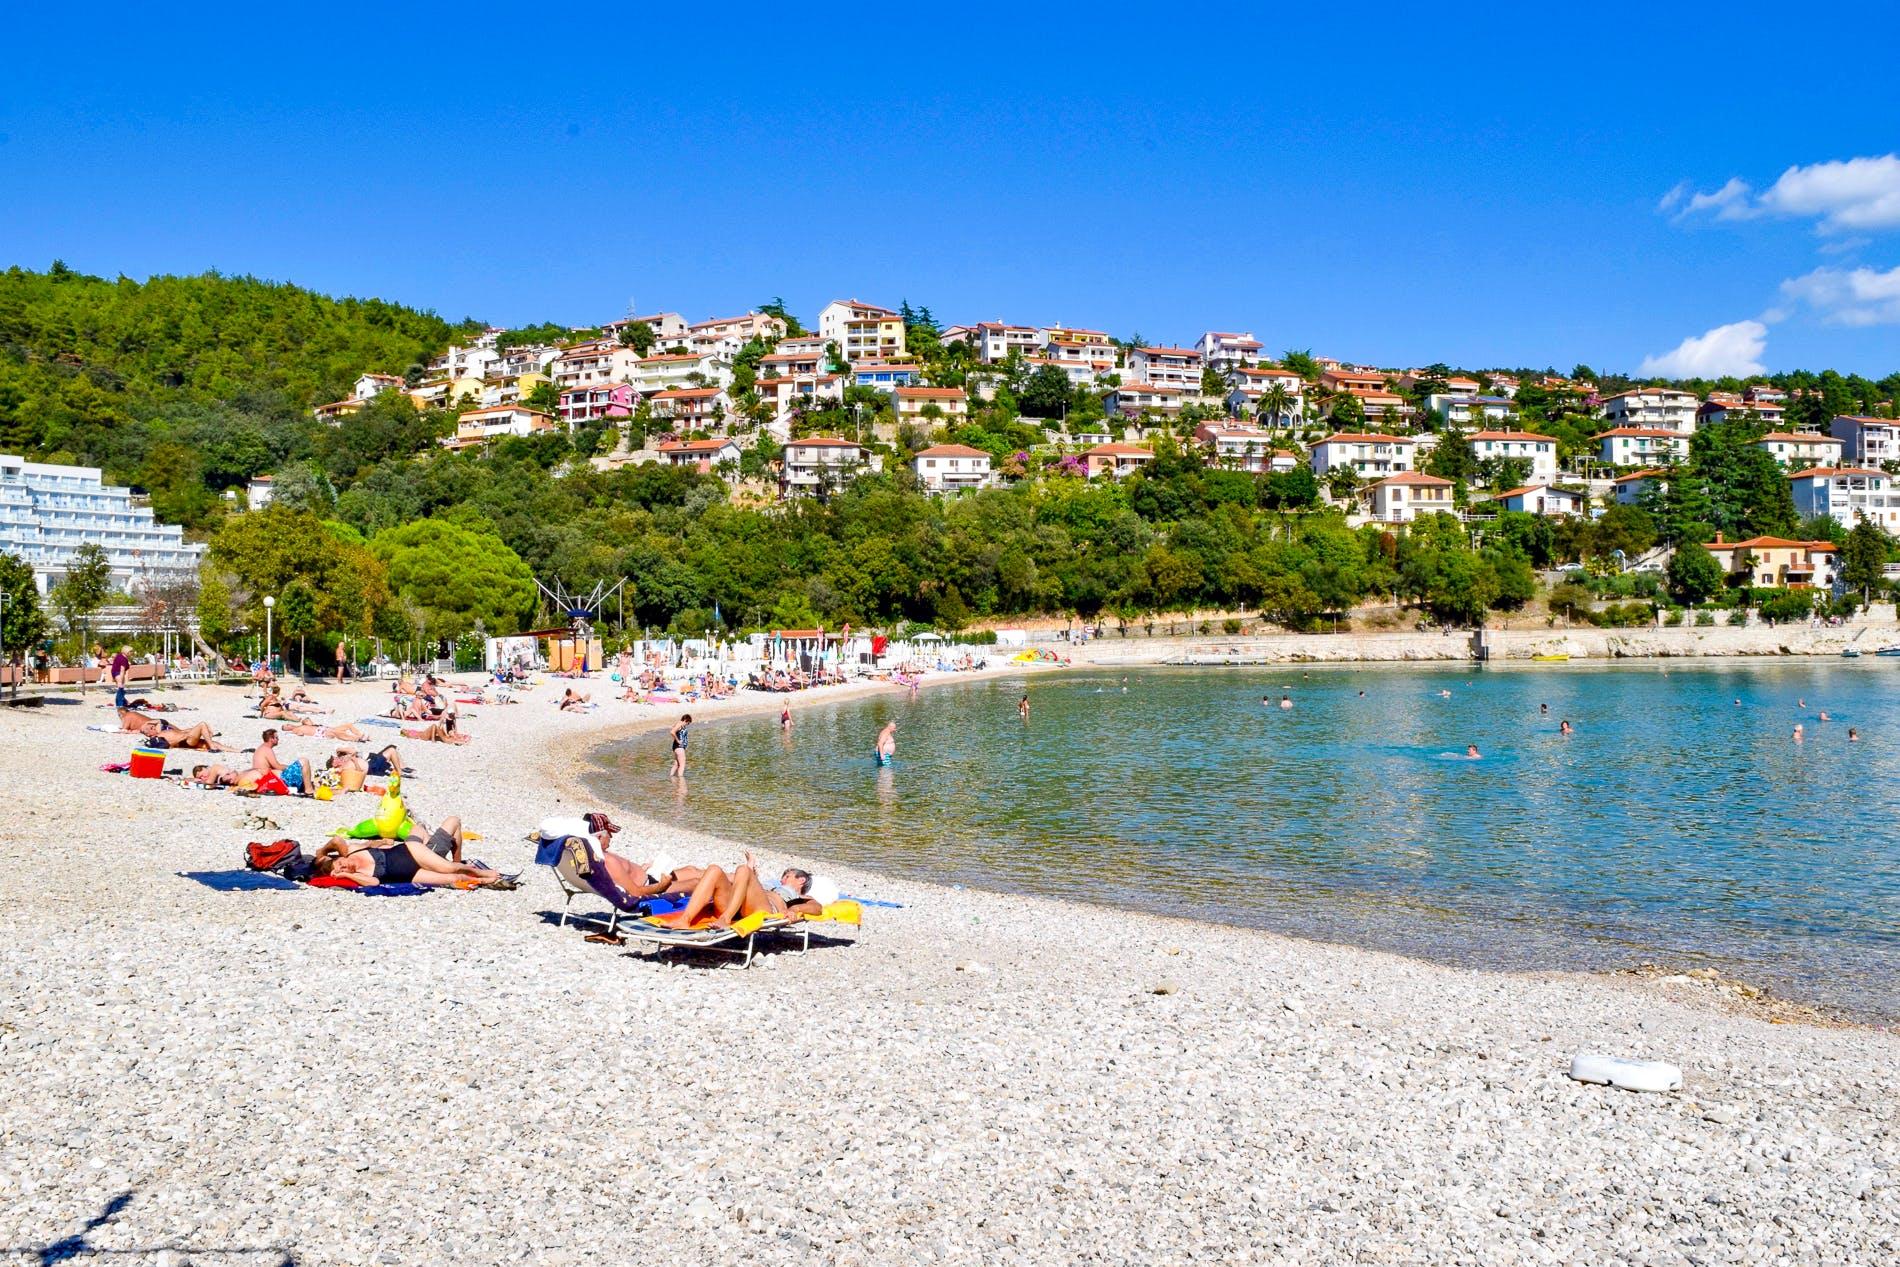 Beach Maslinica, Istria, Croatia